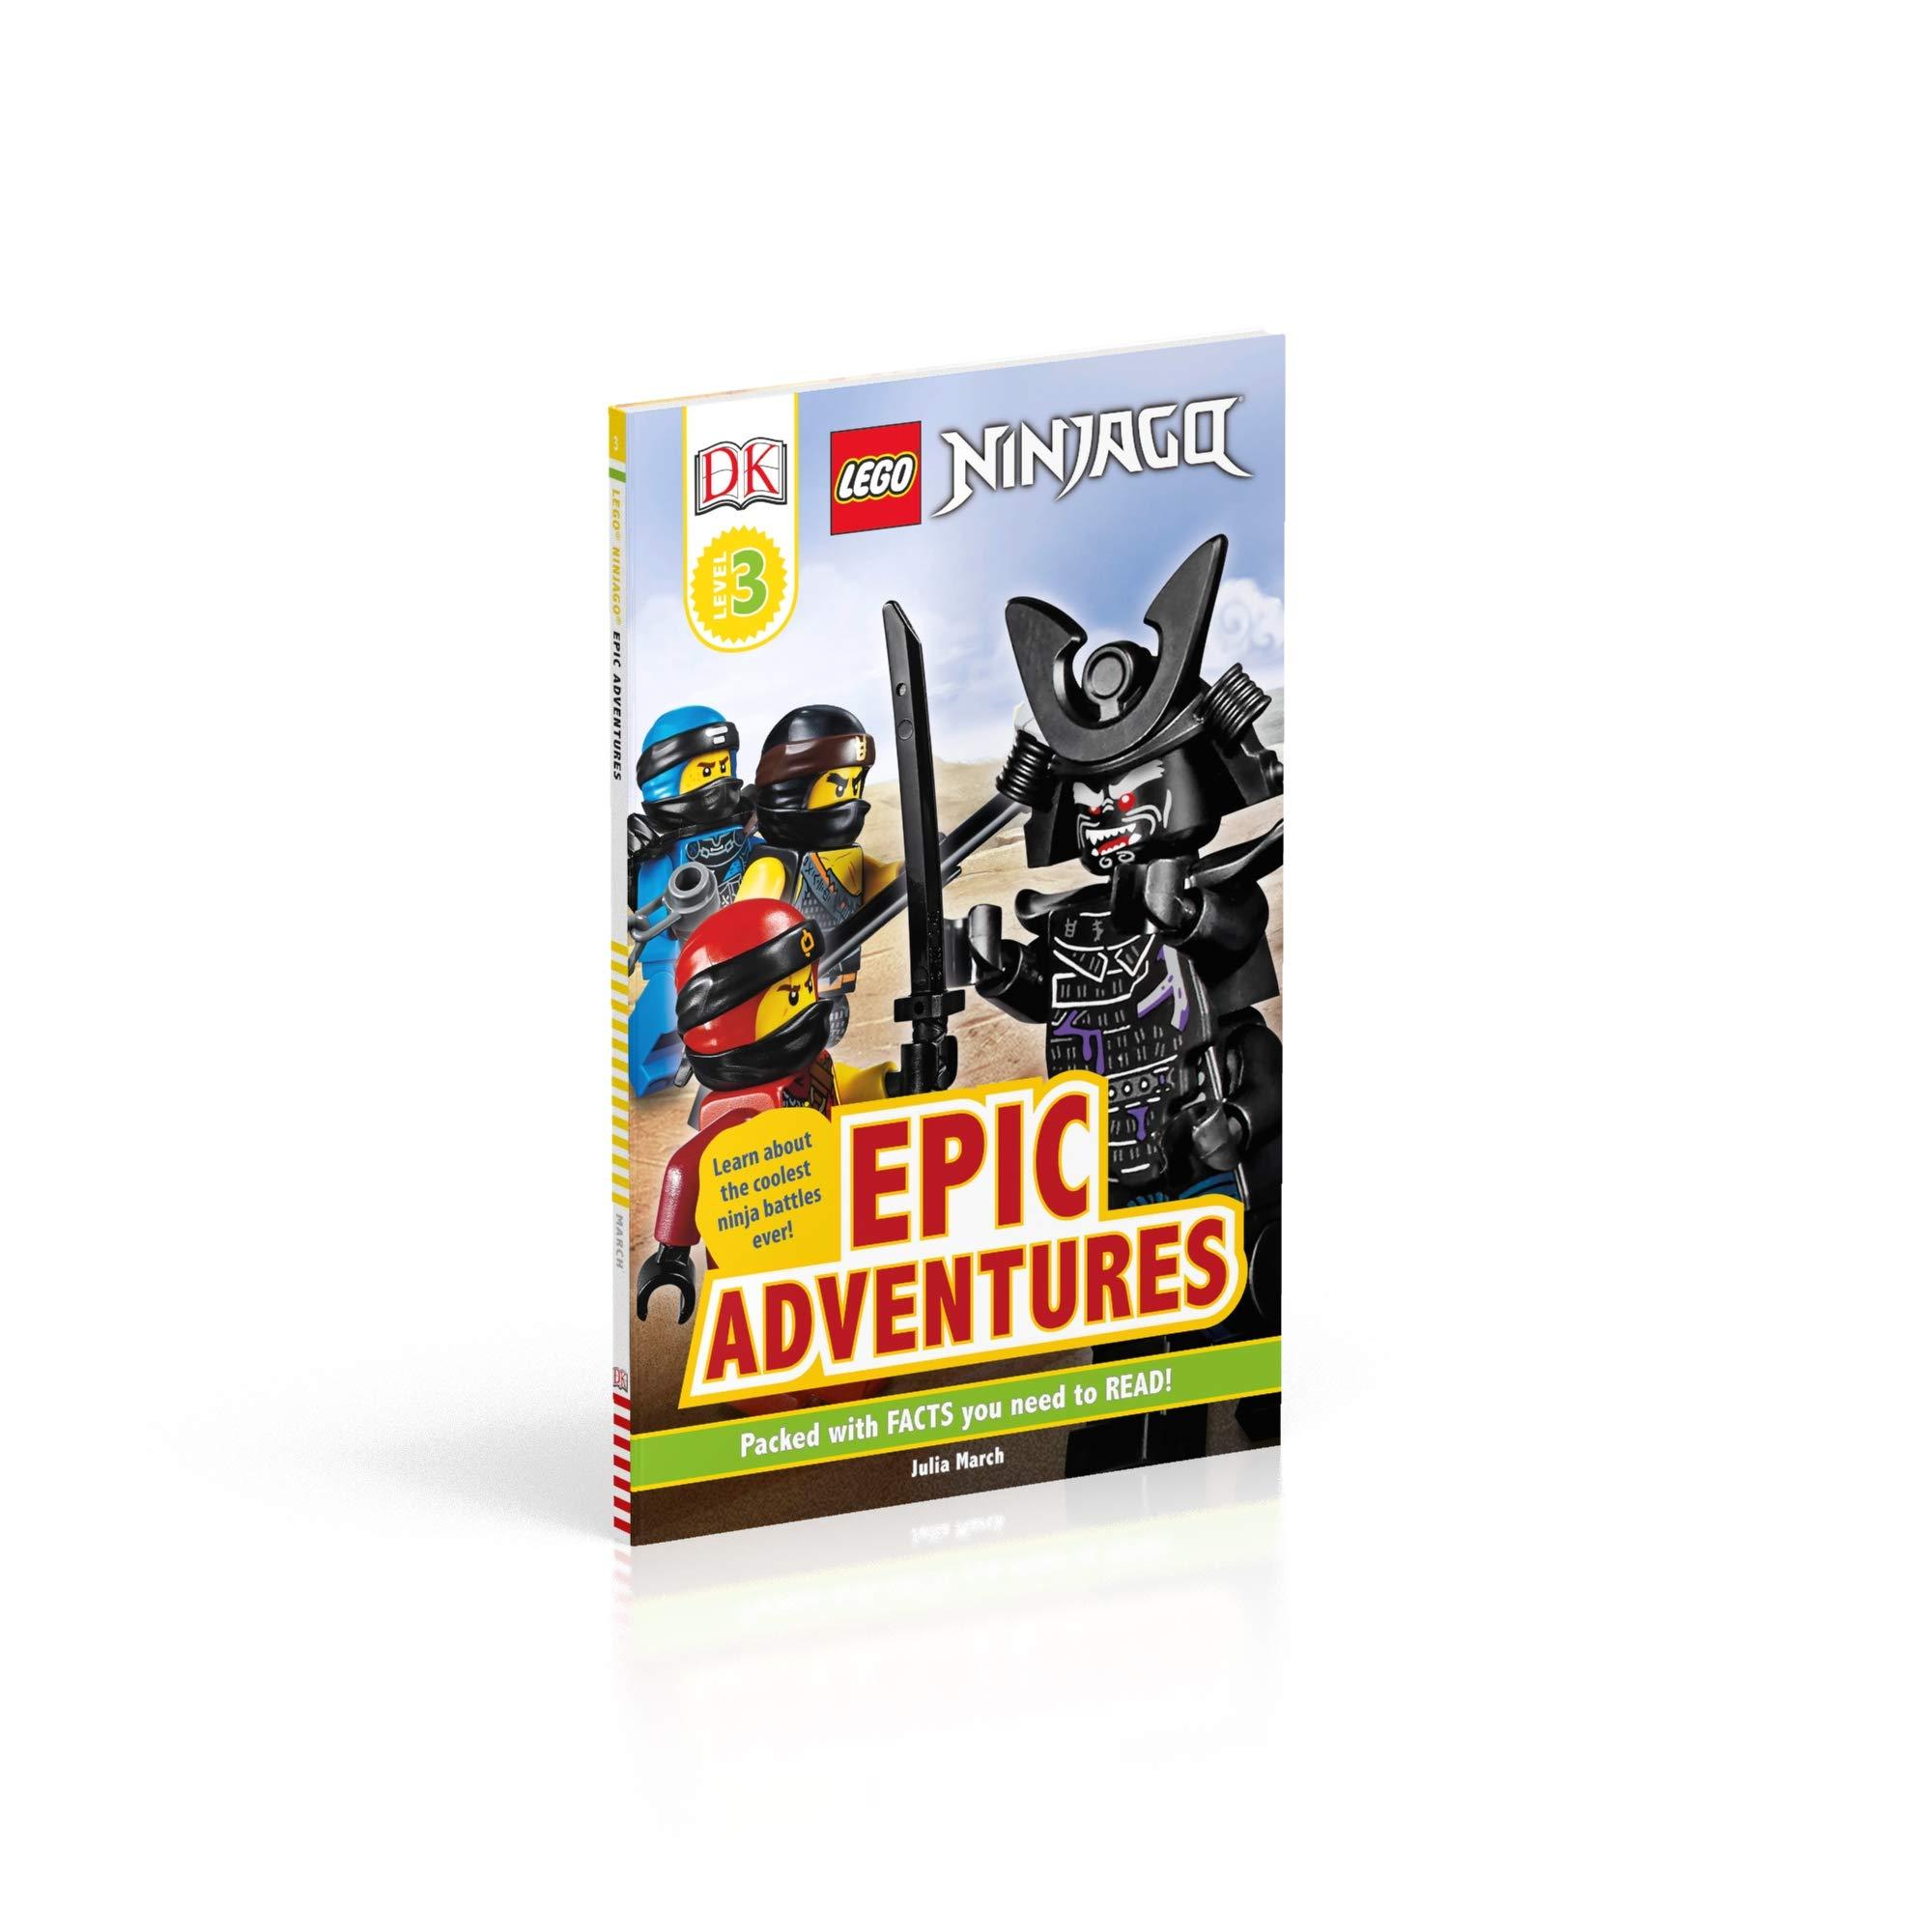 Amazon.com: LEGO NINJAGO Epic Adventures (9780241375976 ...